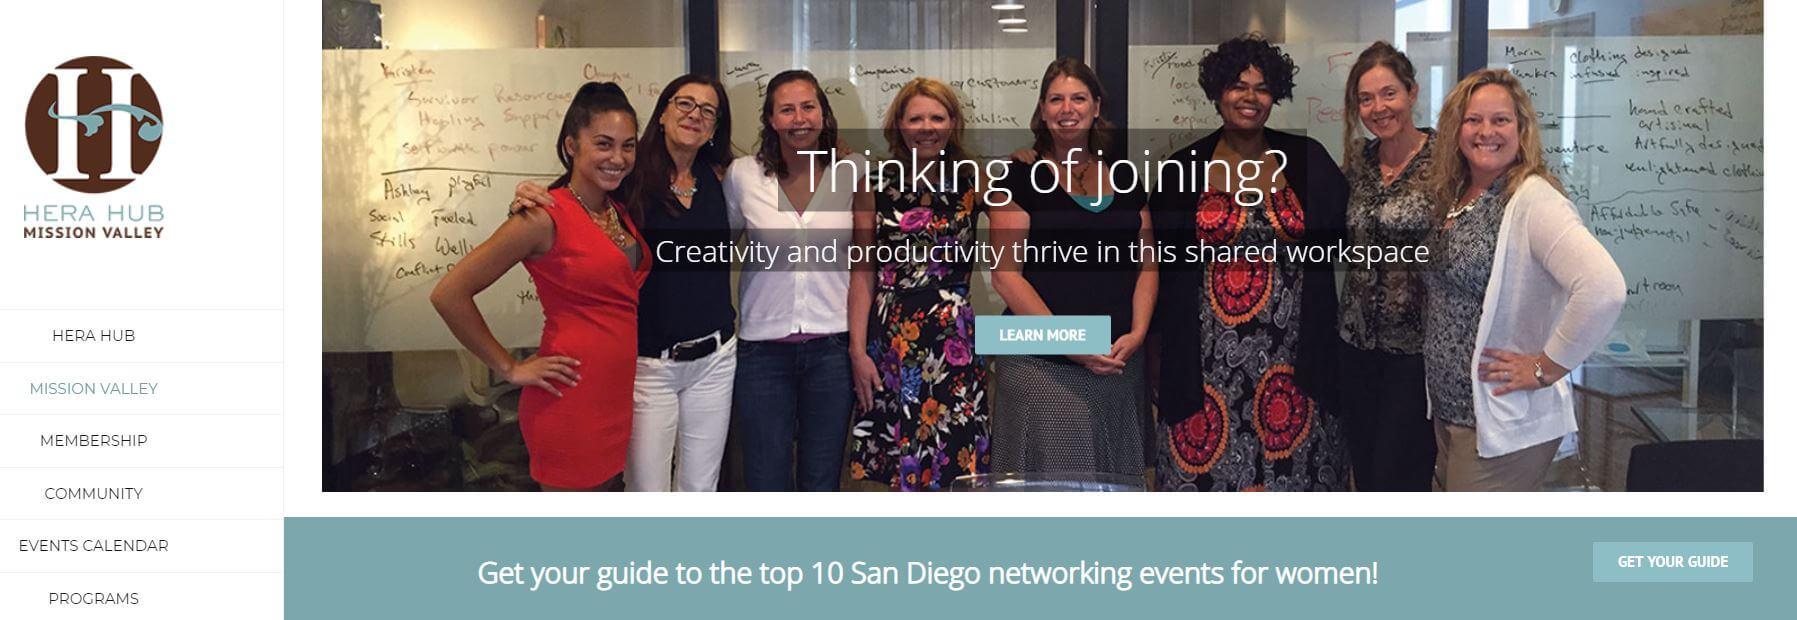 Hera Hub San Diego Website Image